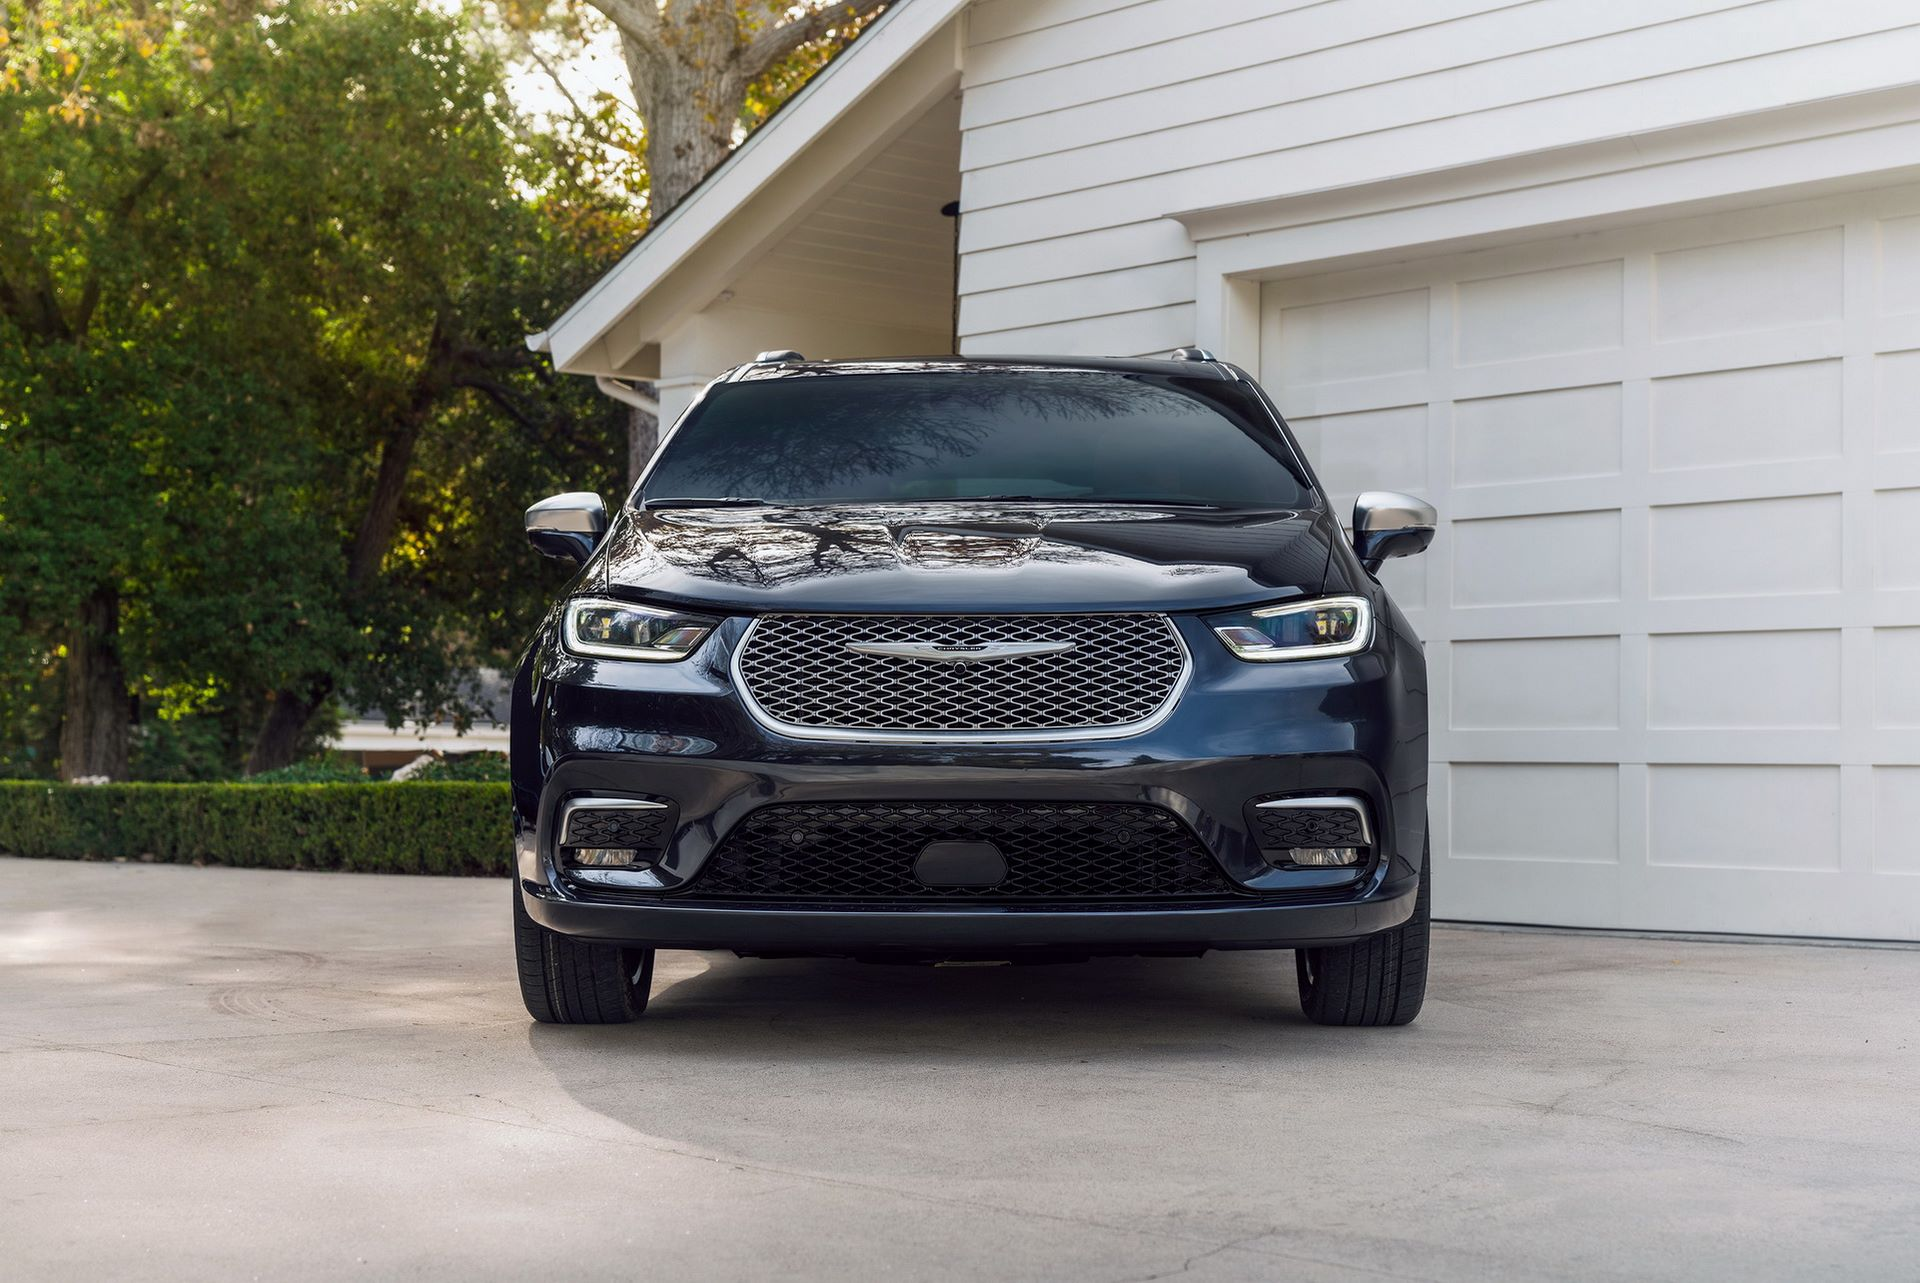 2021-Chrysler-Pacifica-11